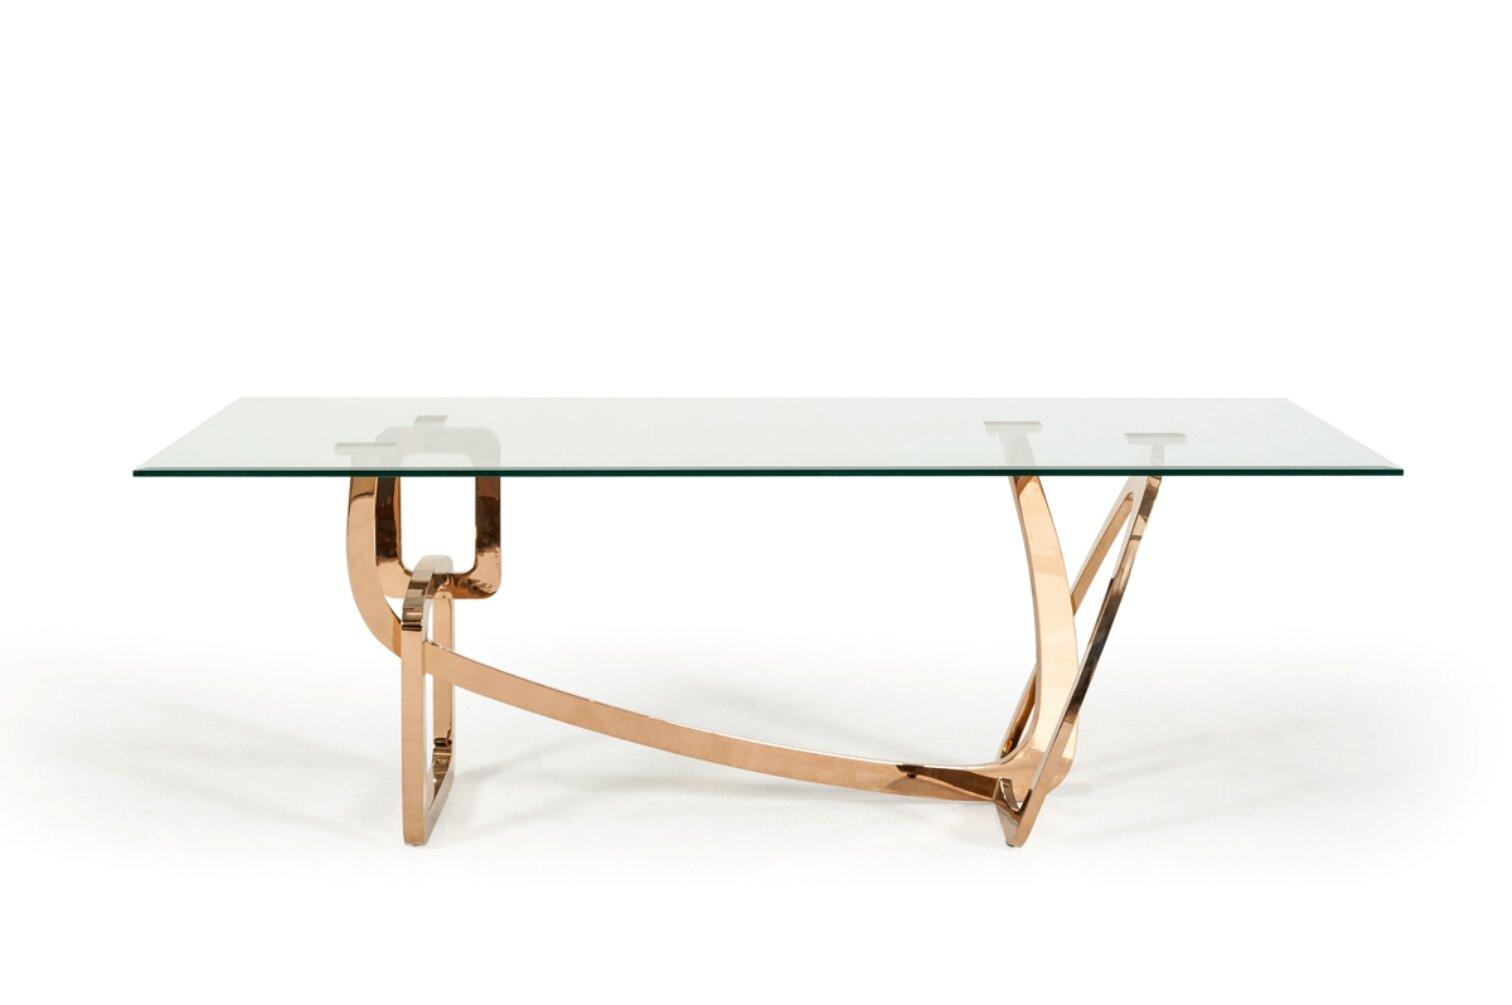 Orren ellis clower glass top dining table wayfair